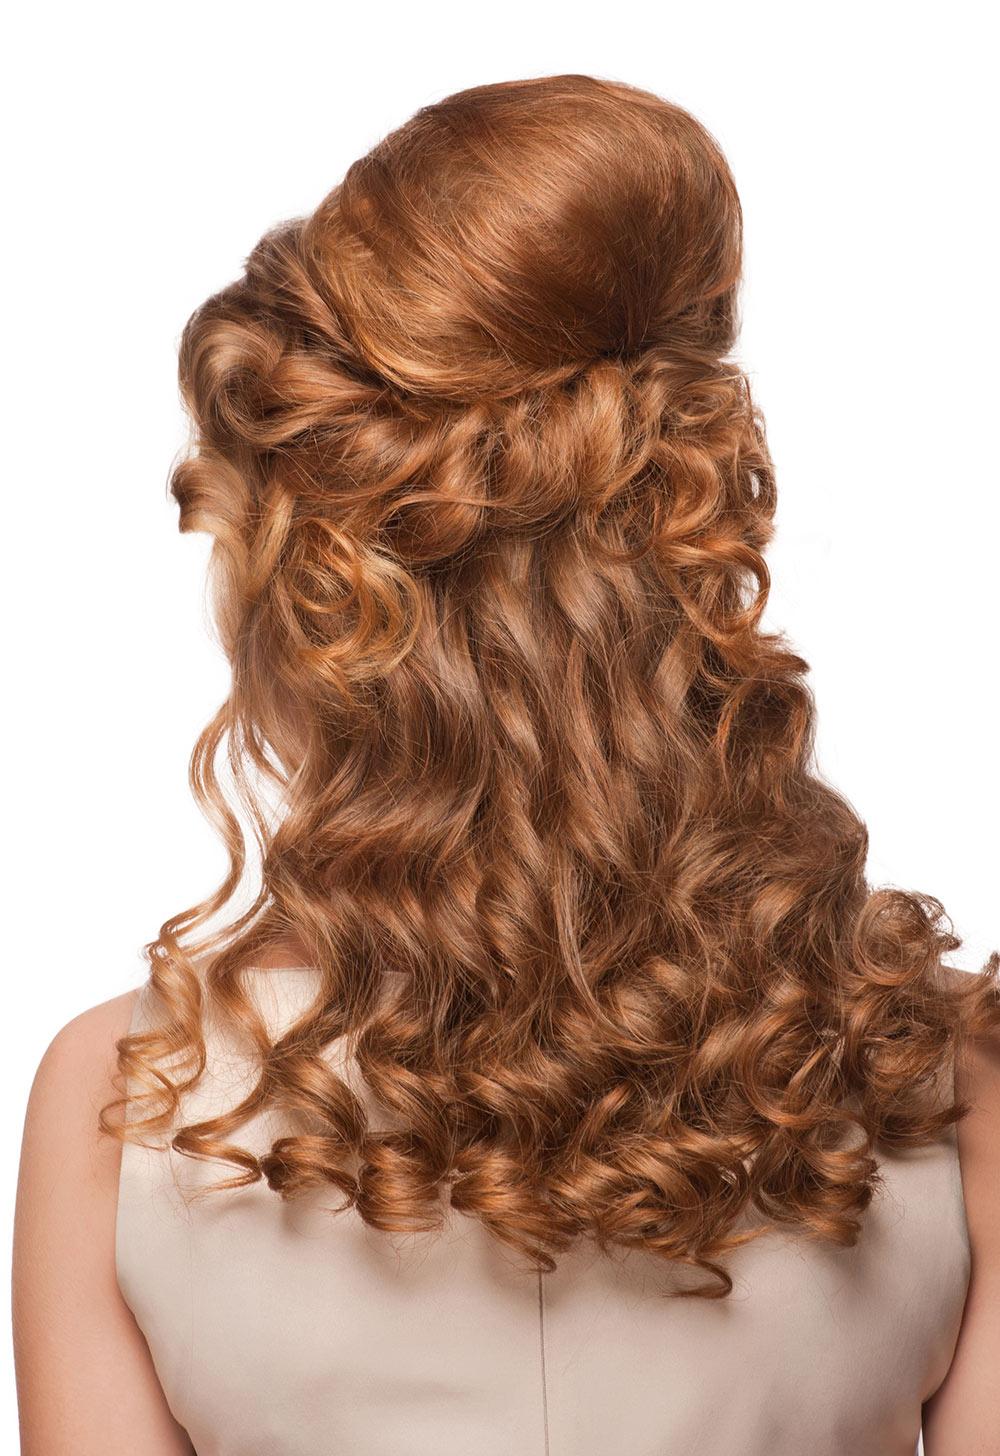 Wedding Hair Half Up Style on Red Hair